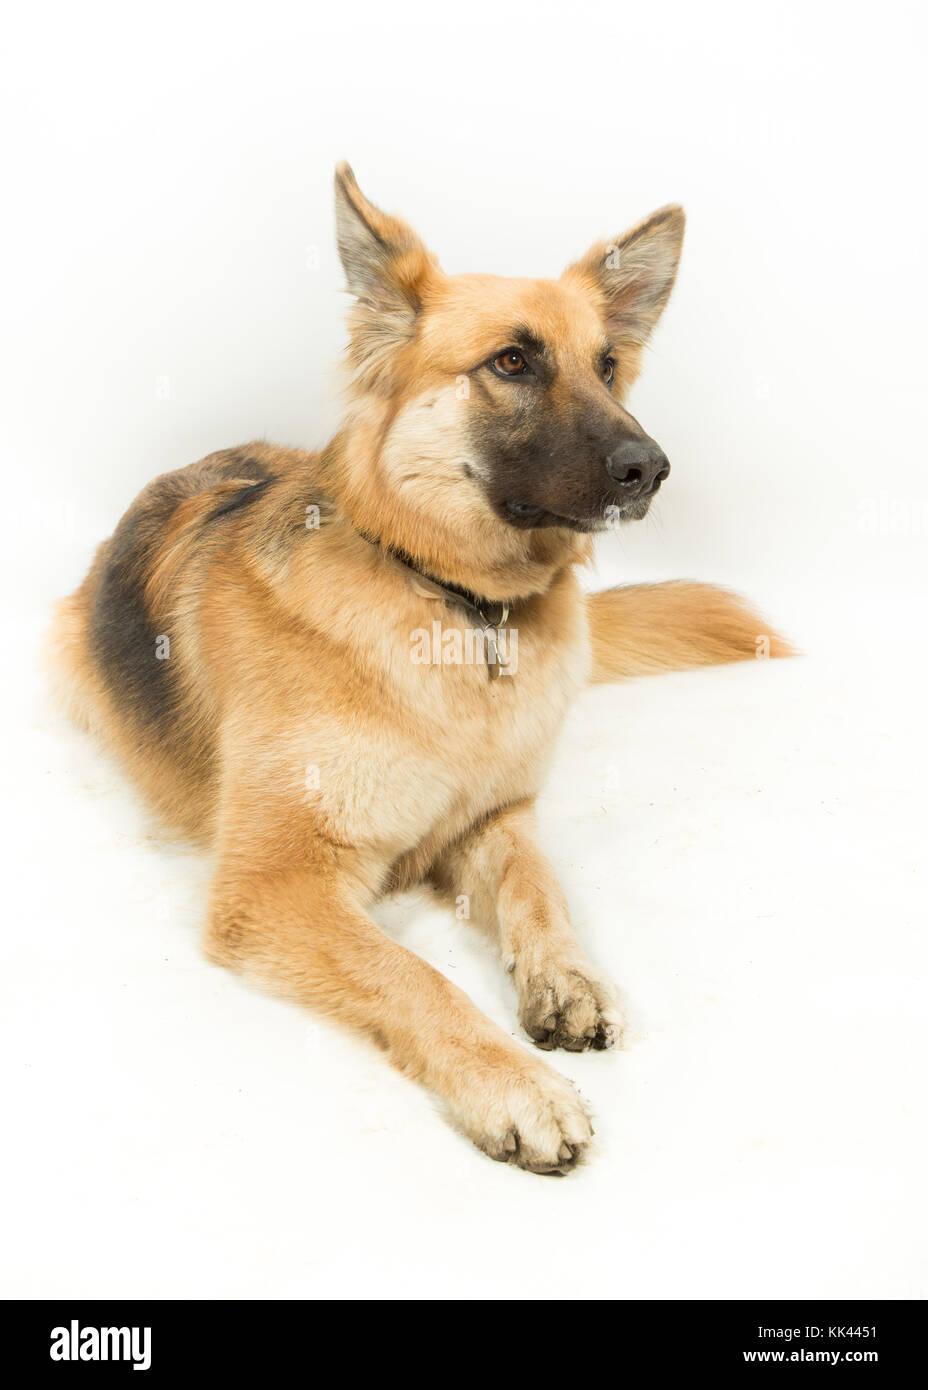 Golden Brown German Shepherd Alsatian Dog Lying Down on White Background - Stock Image